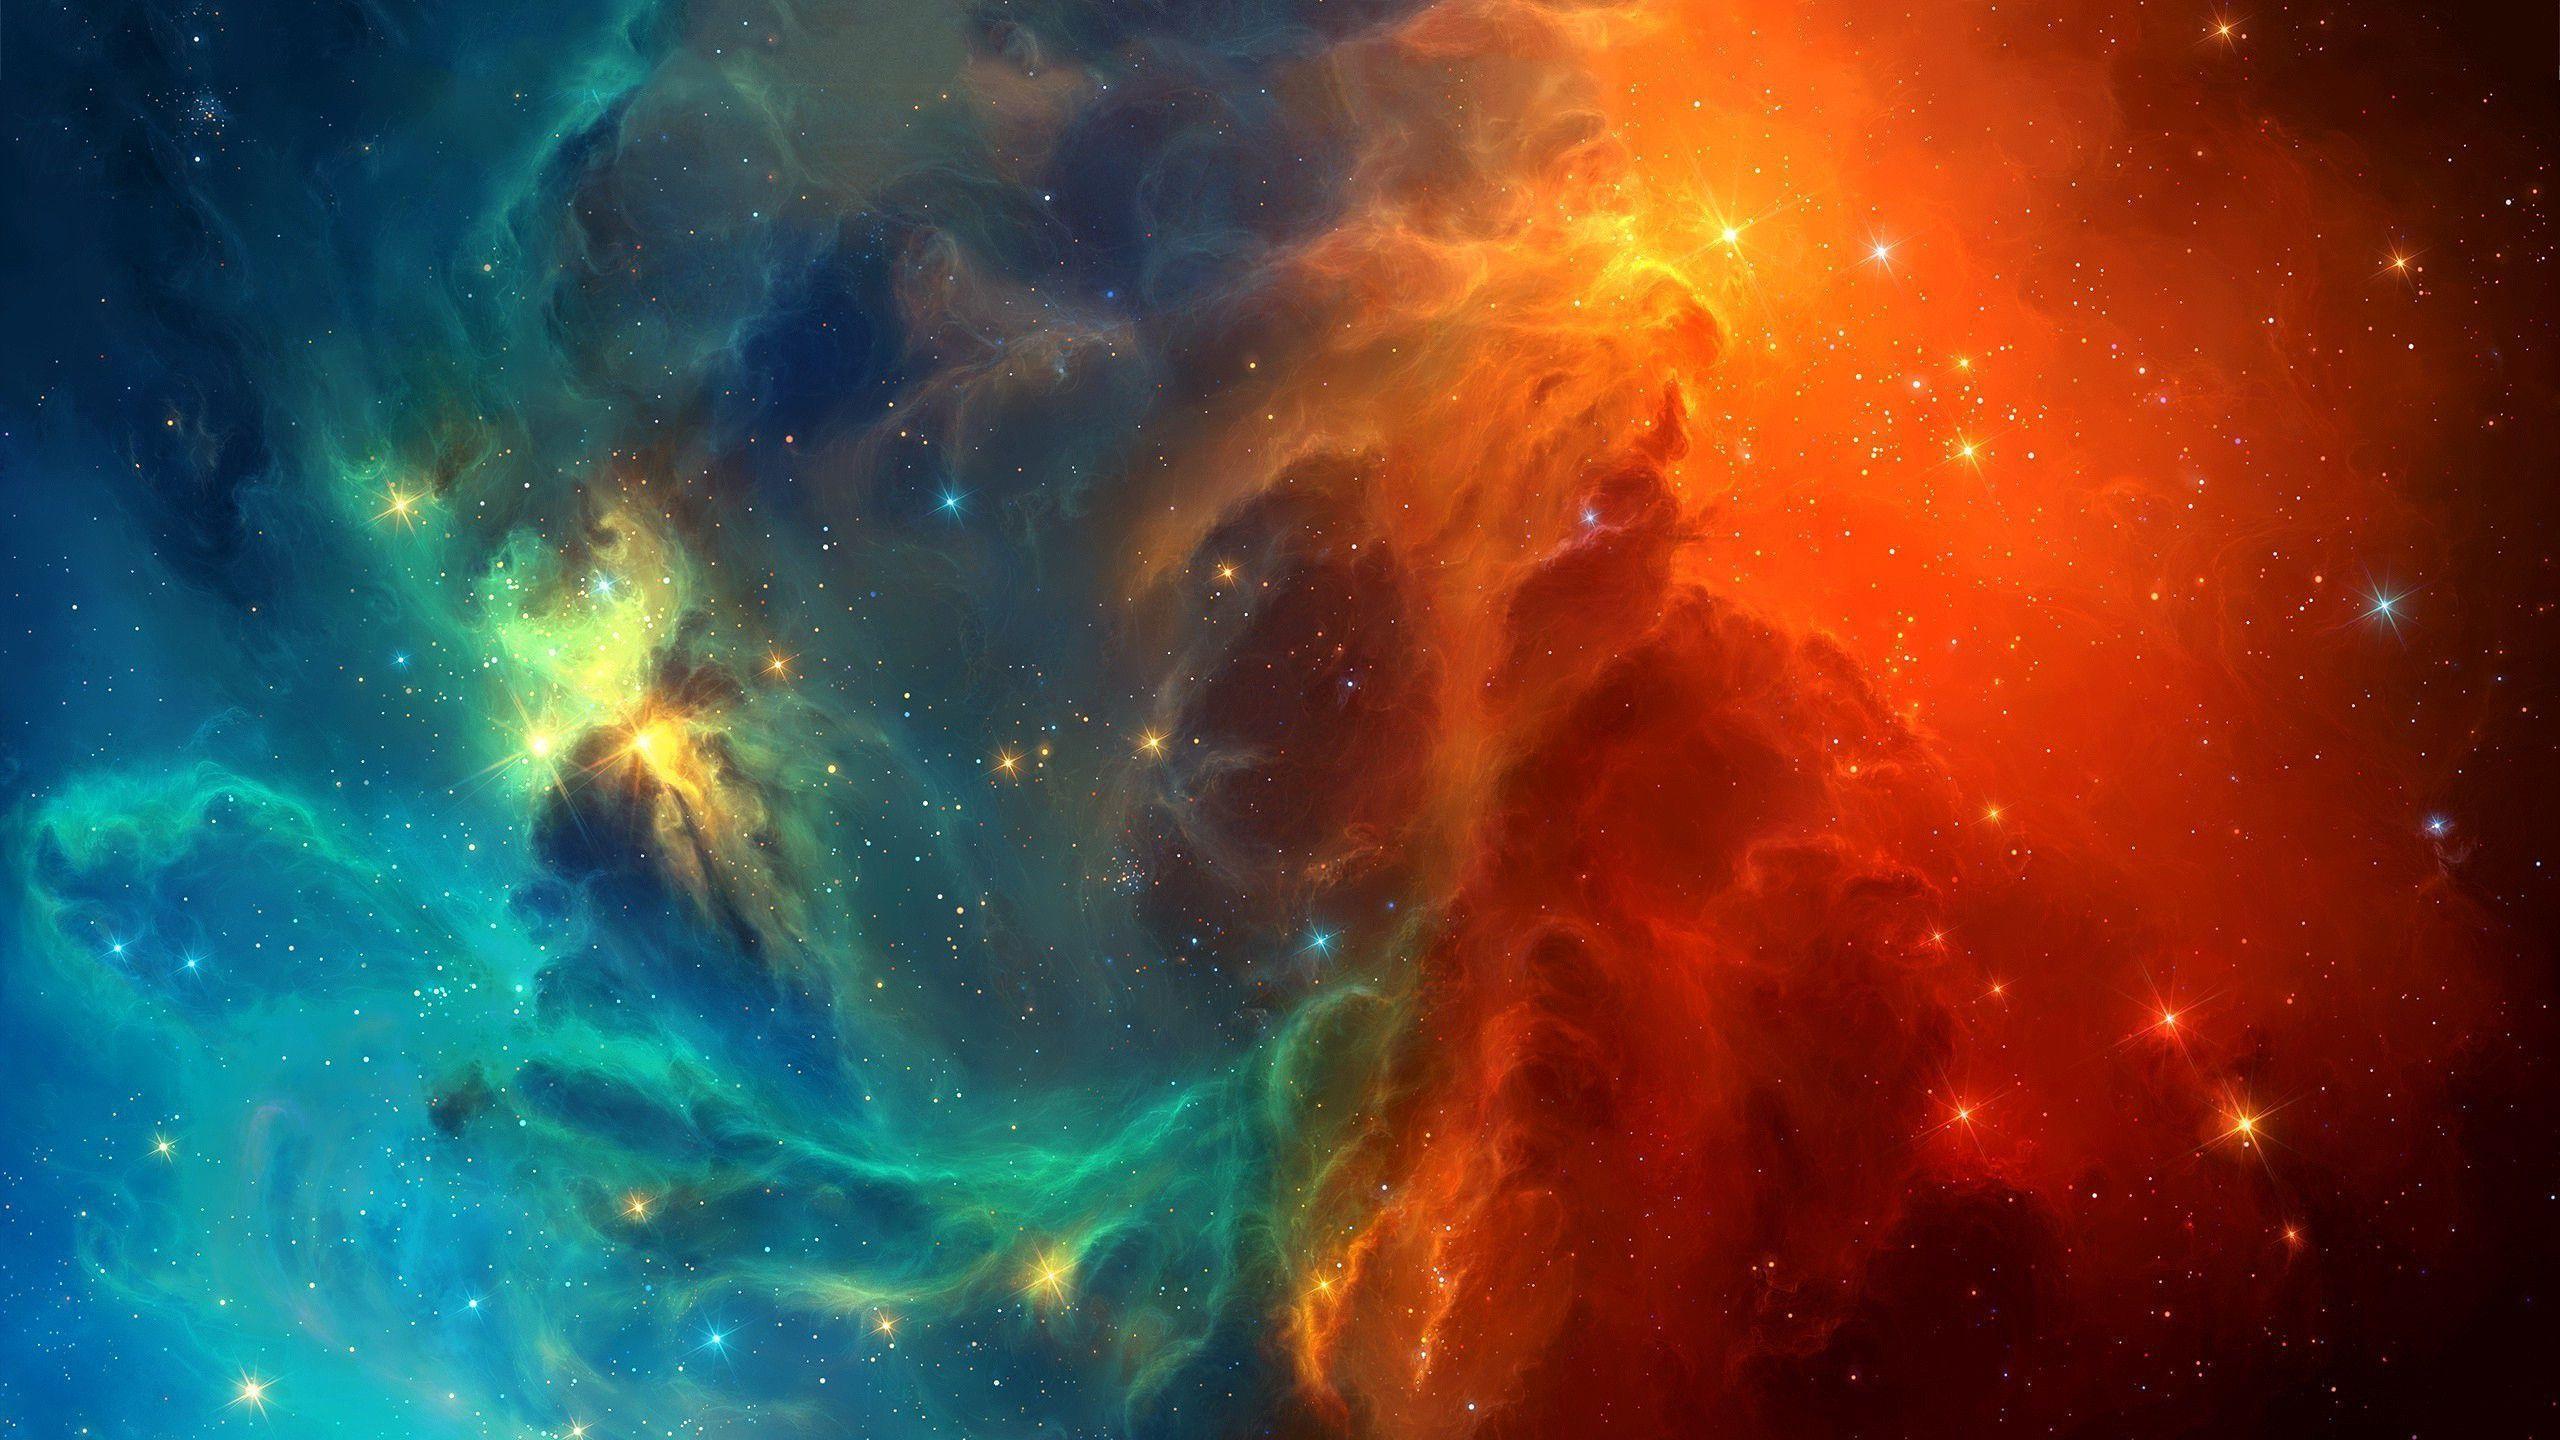 2560x1440 Space nebula stars Wallpaper